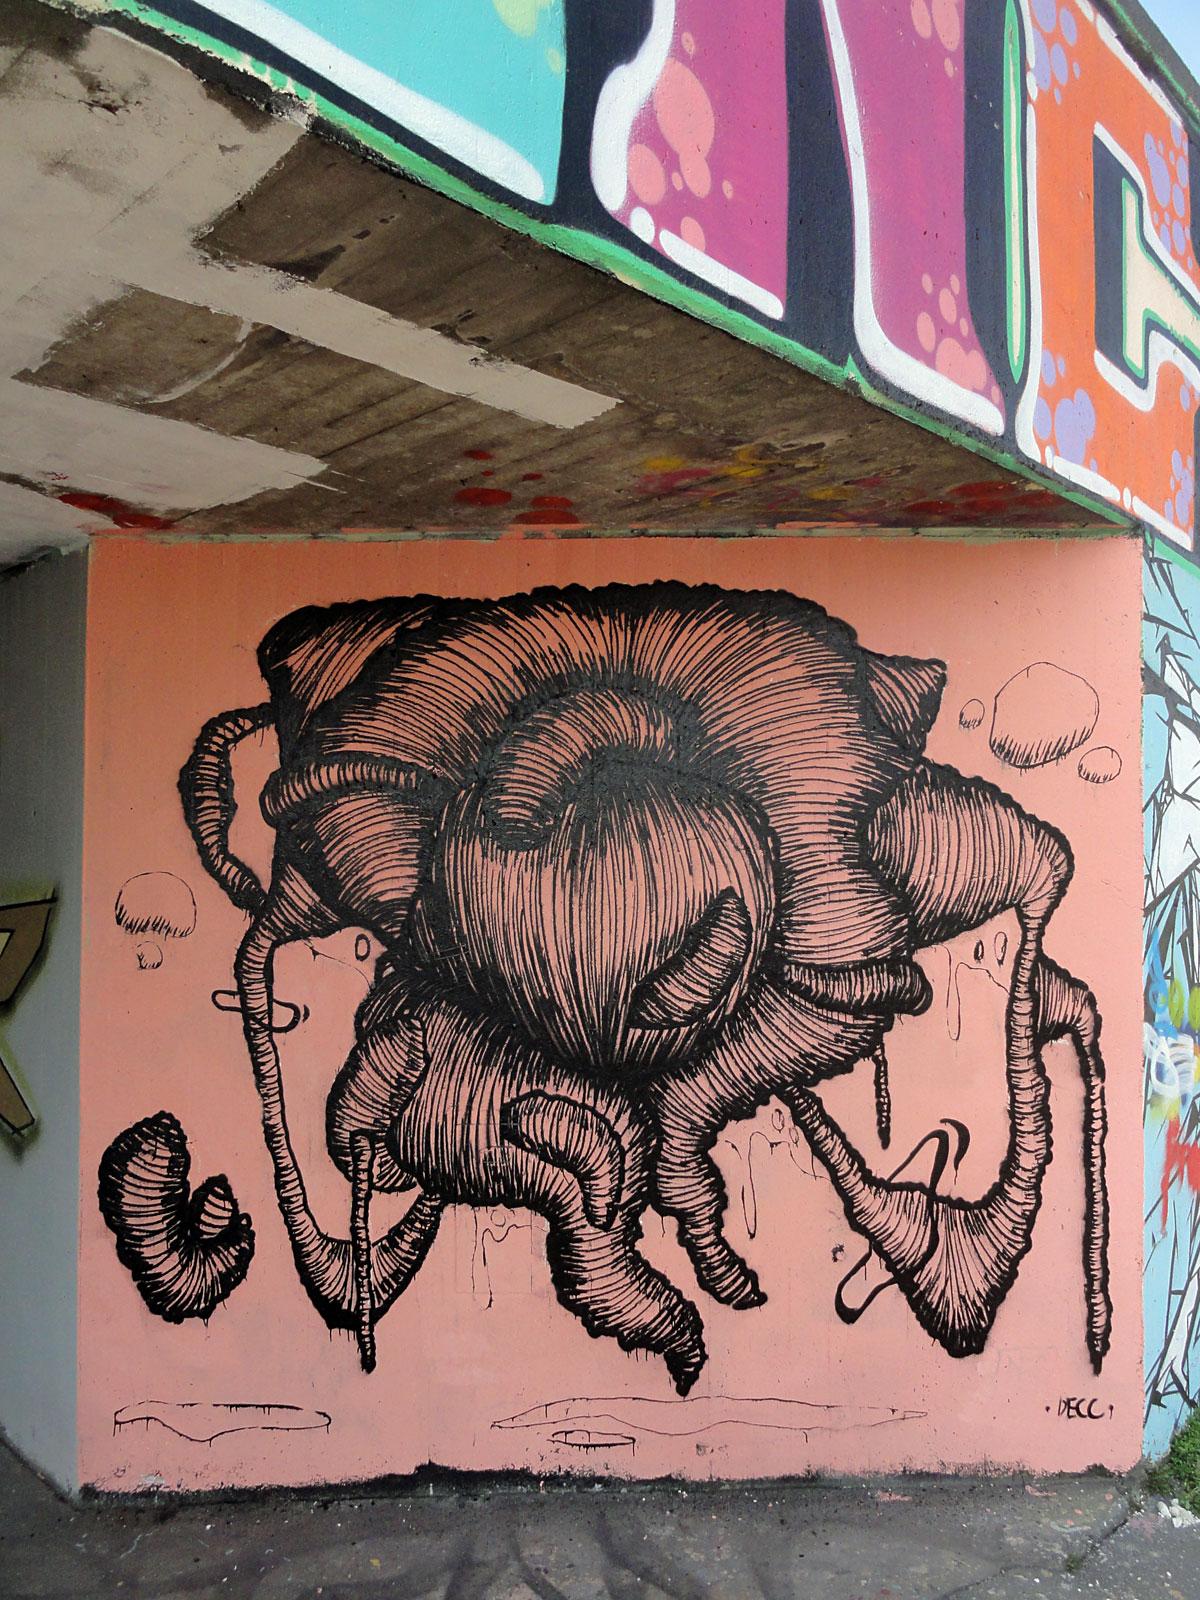 decc-graffiti-hanauer-landstrasse